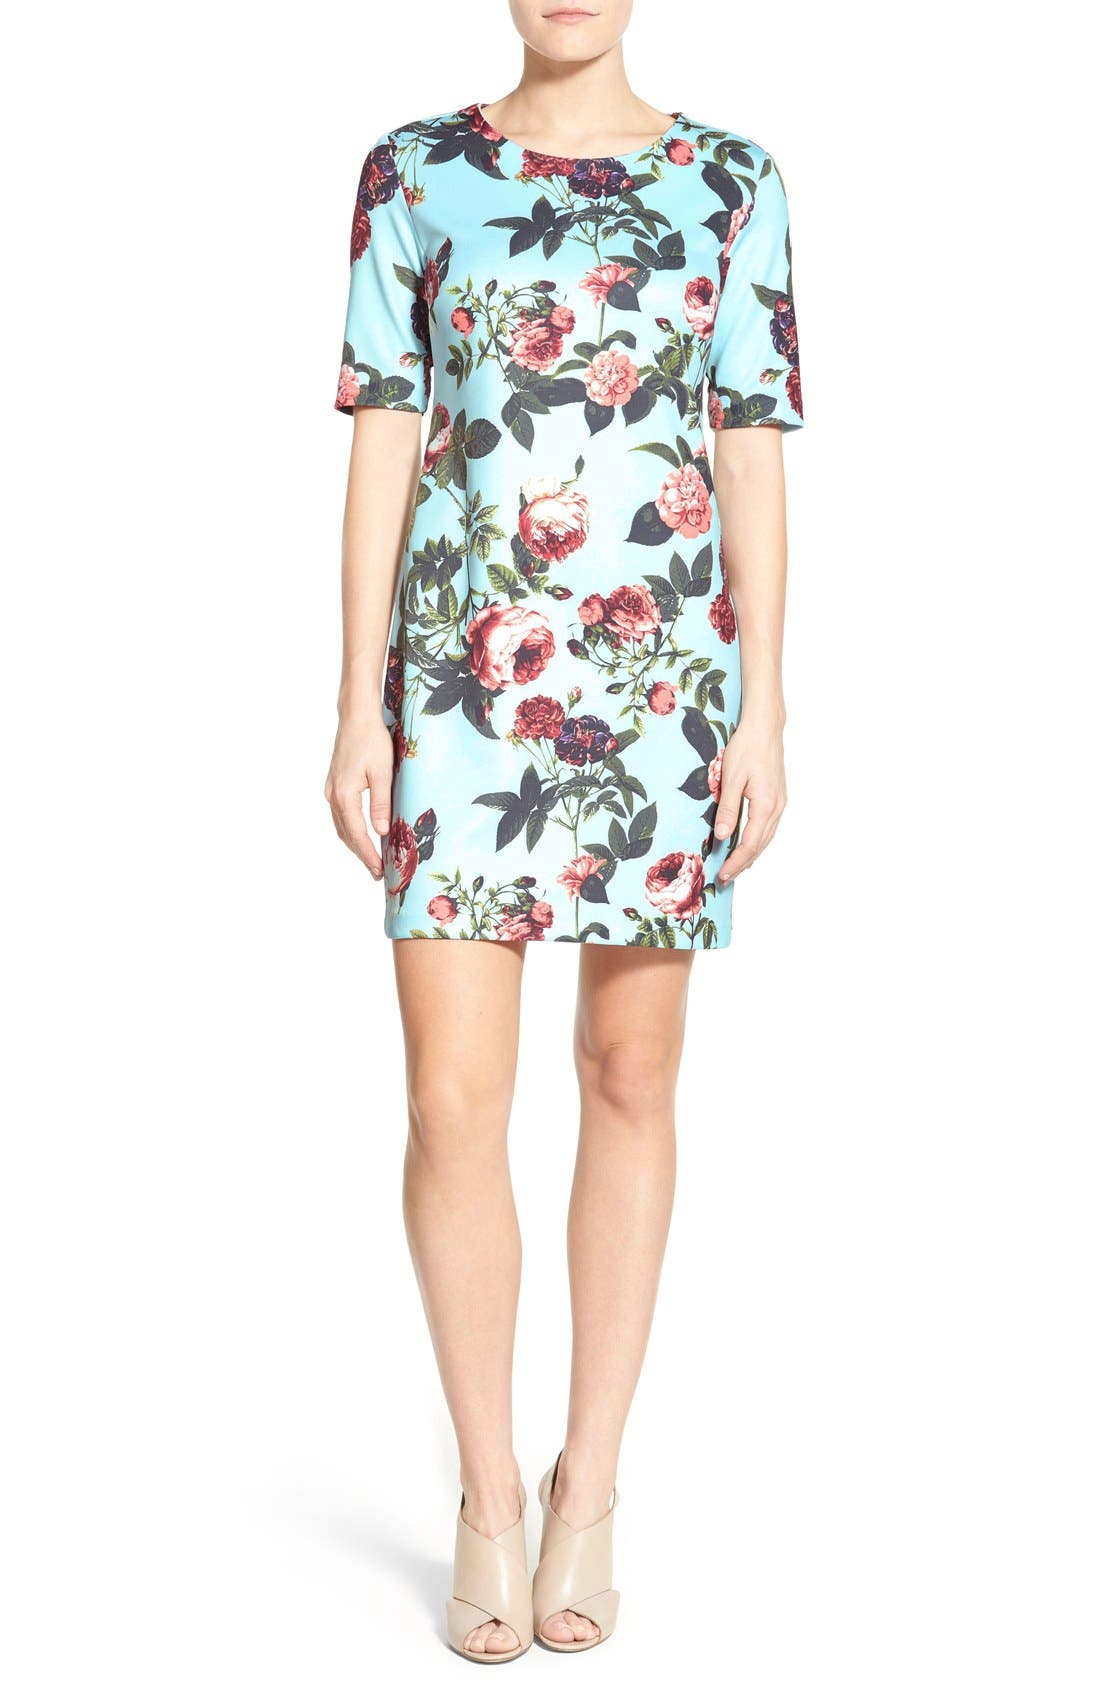 by Cynthia Steffe 'Bouquet Estate' Floral Print Scuba Knit Sheath Dress,                             Main thumbnail 1, color,                             Clearwater